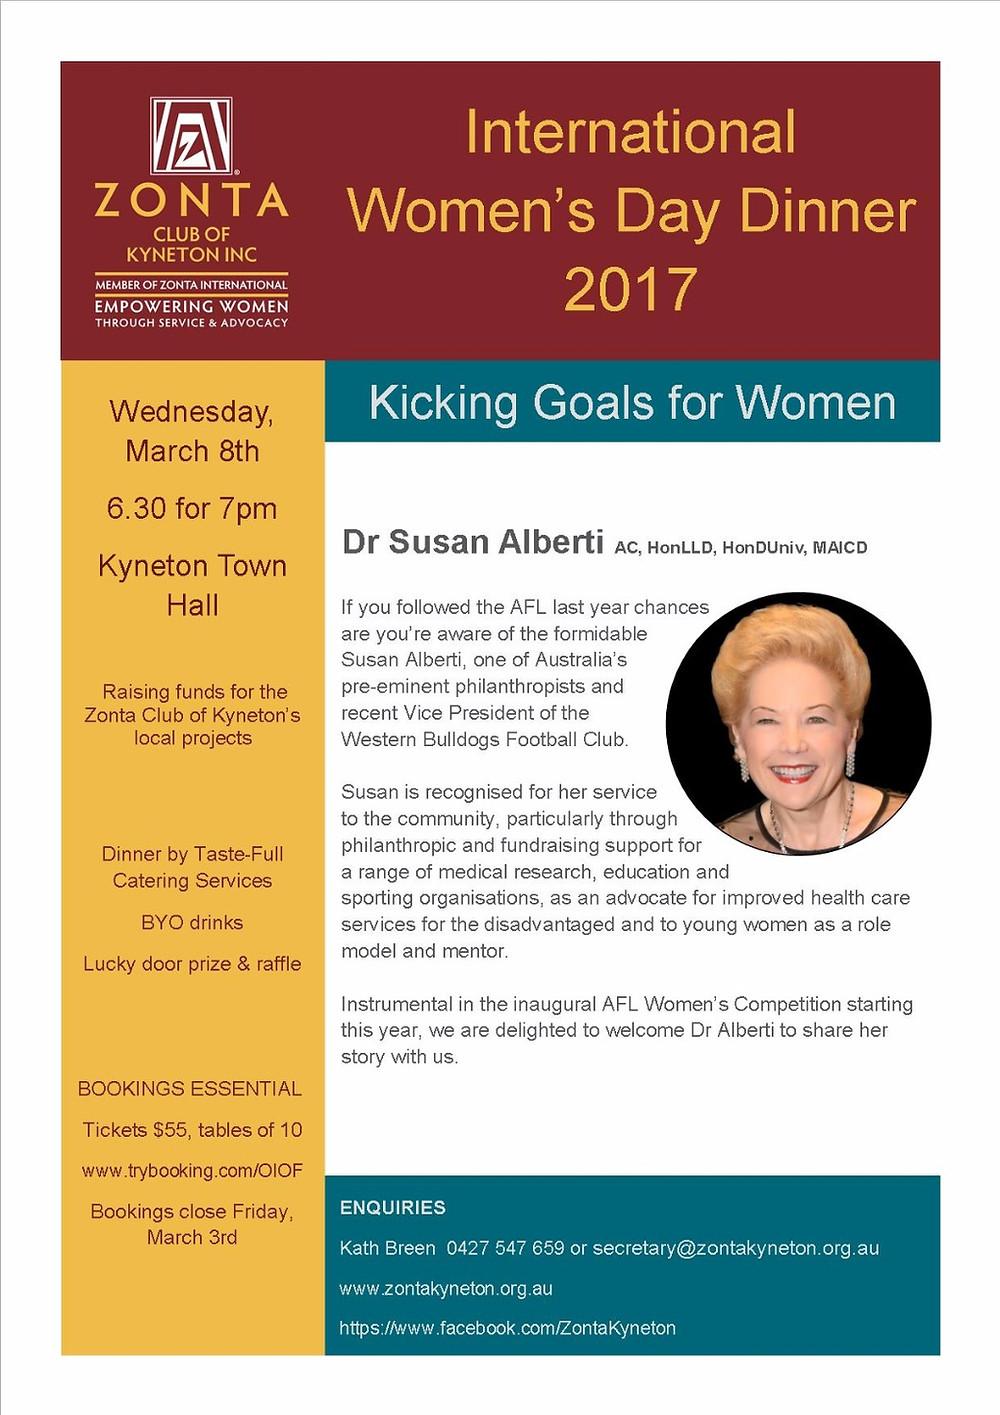 Zonta Club of Kyneton International Women's Day Dinner 2017